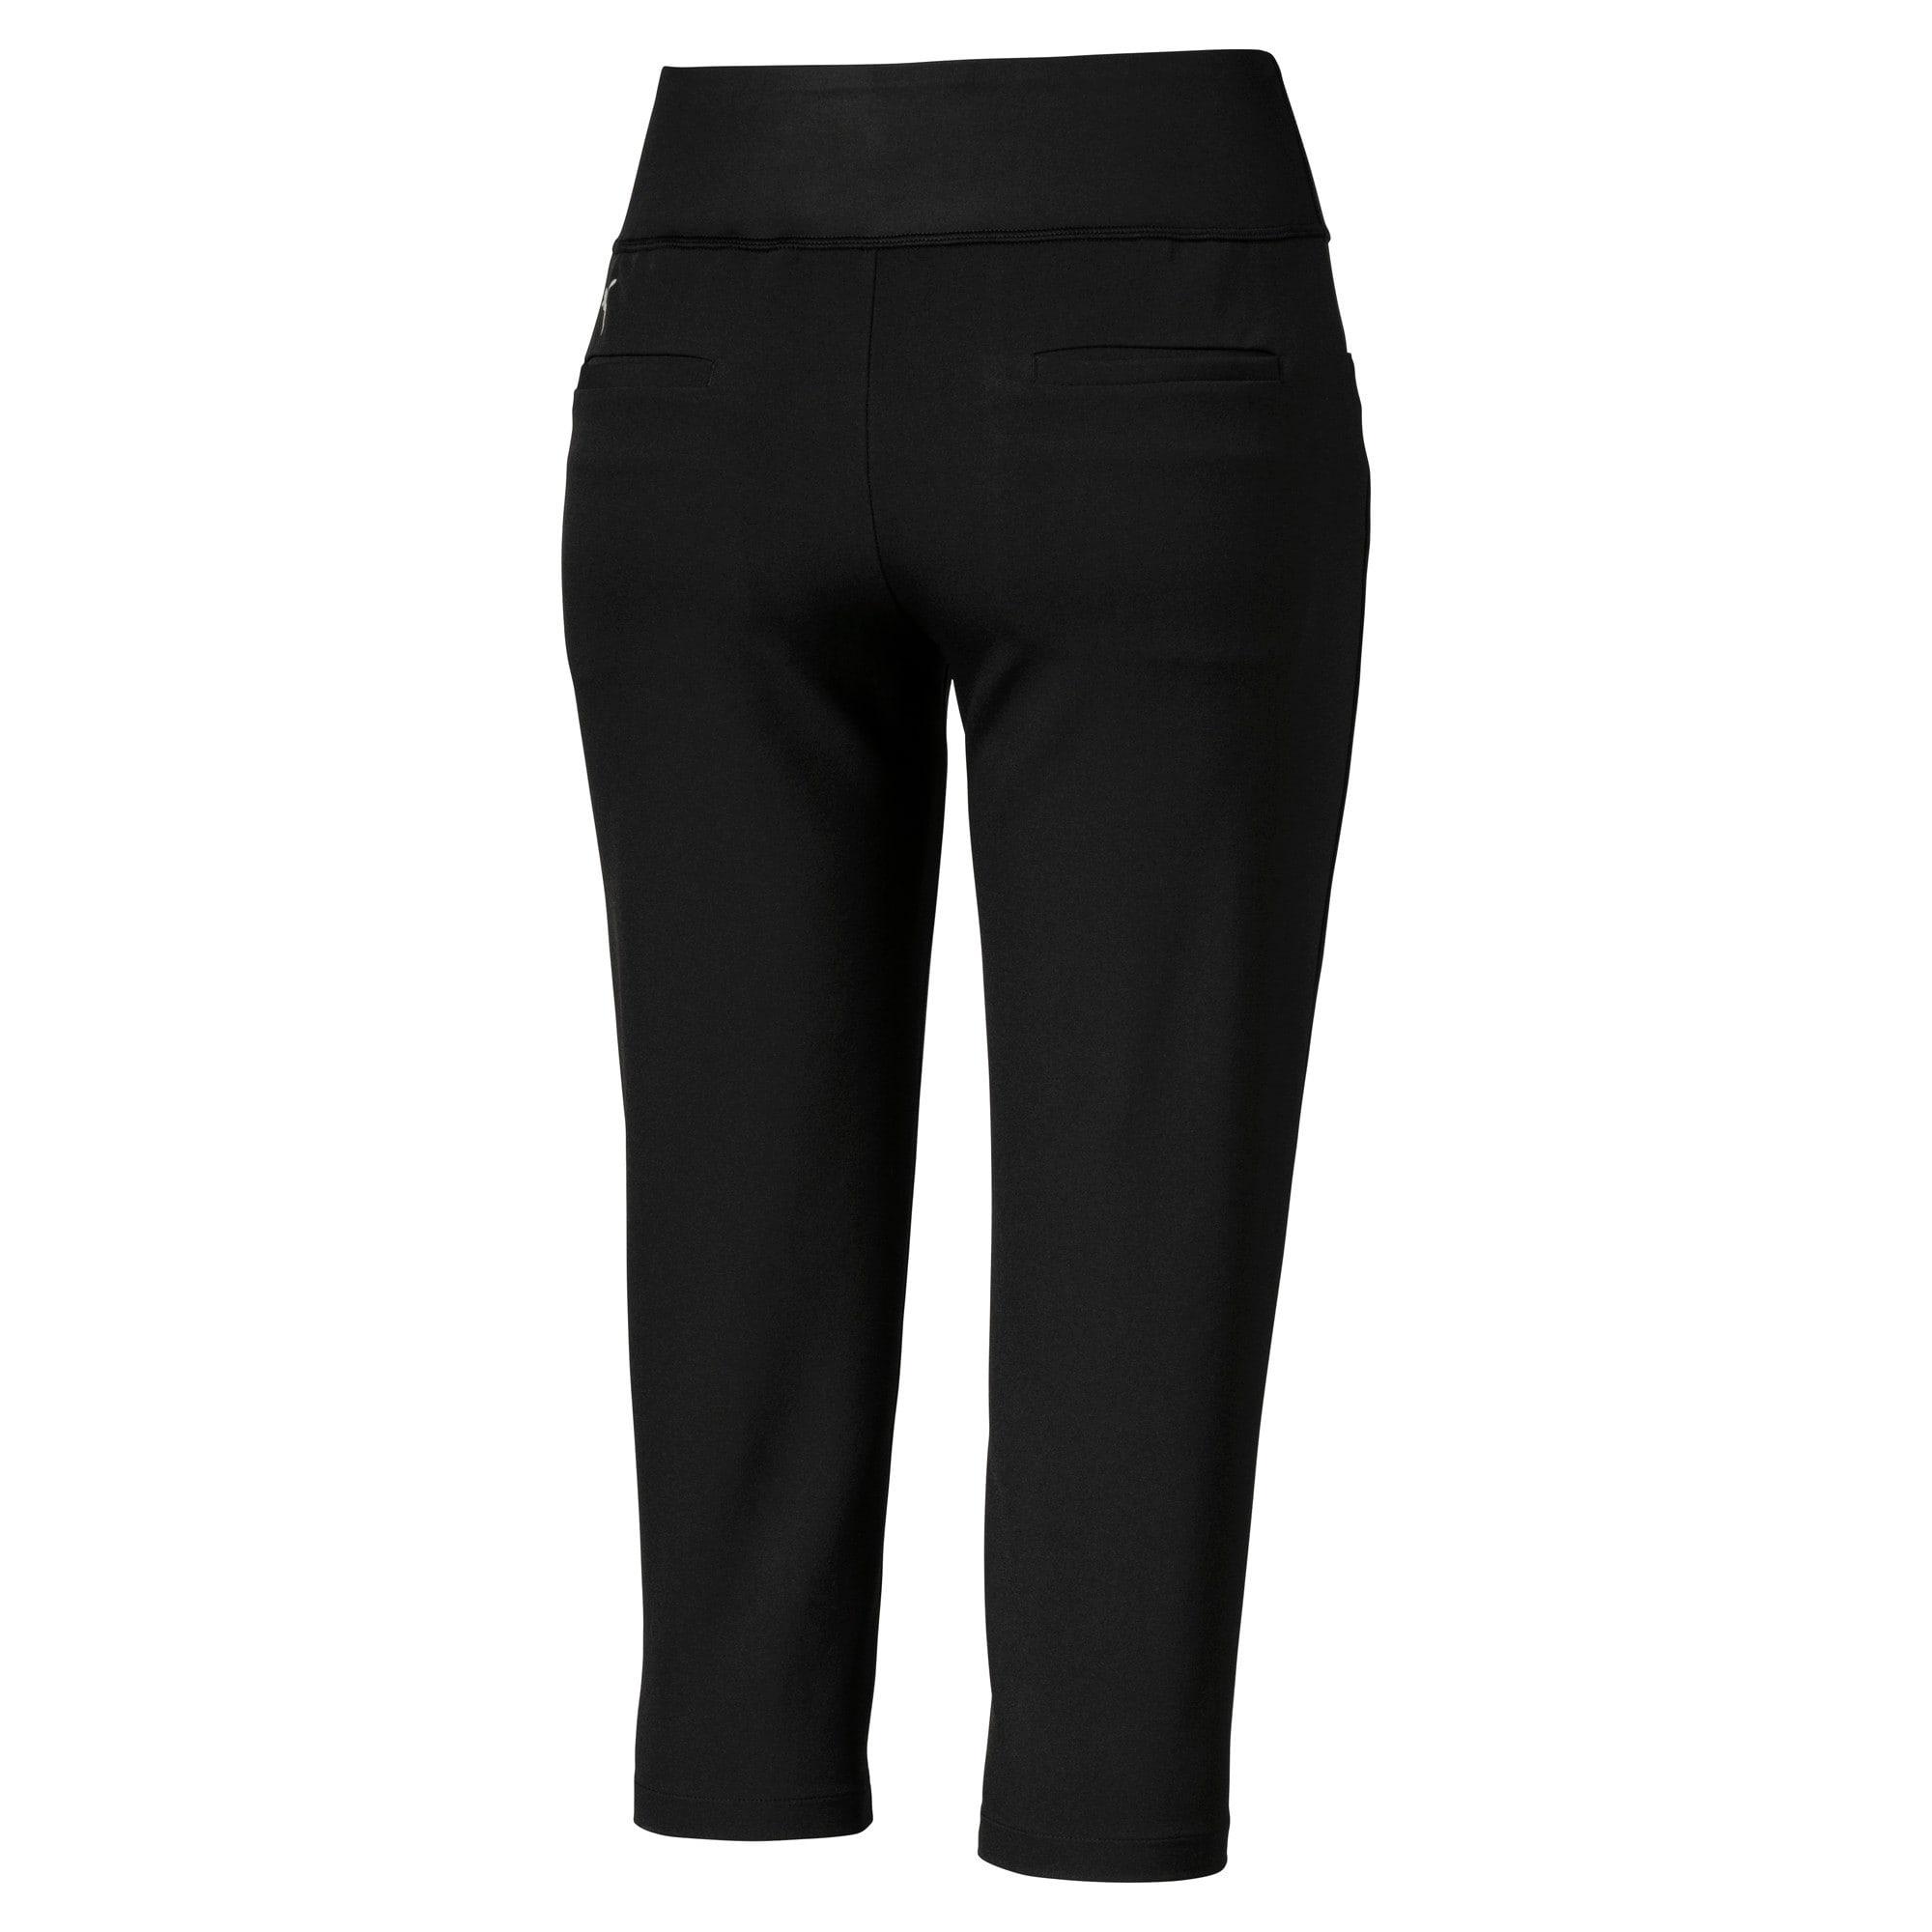 Thumbnail 2 of Golf Women's PWRSHAPE Capri Pants, Puma Black, medium